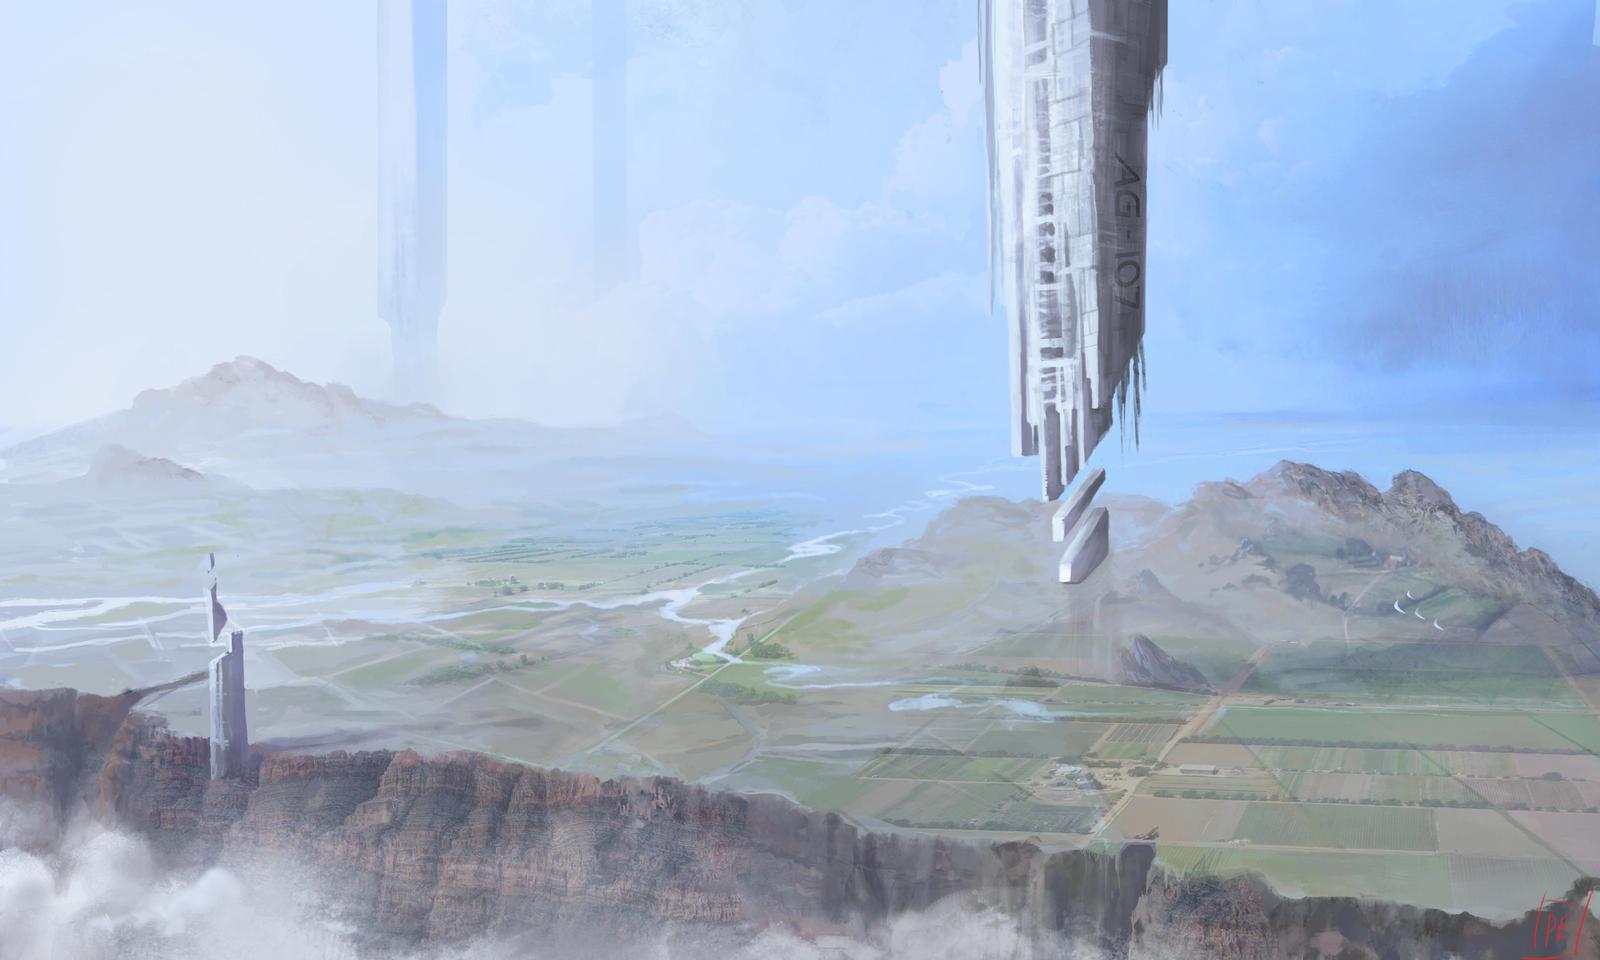 Farmland Concept by Solfour